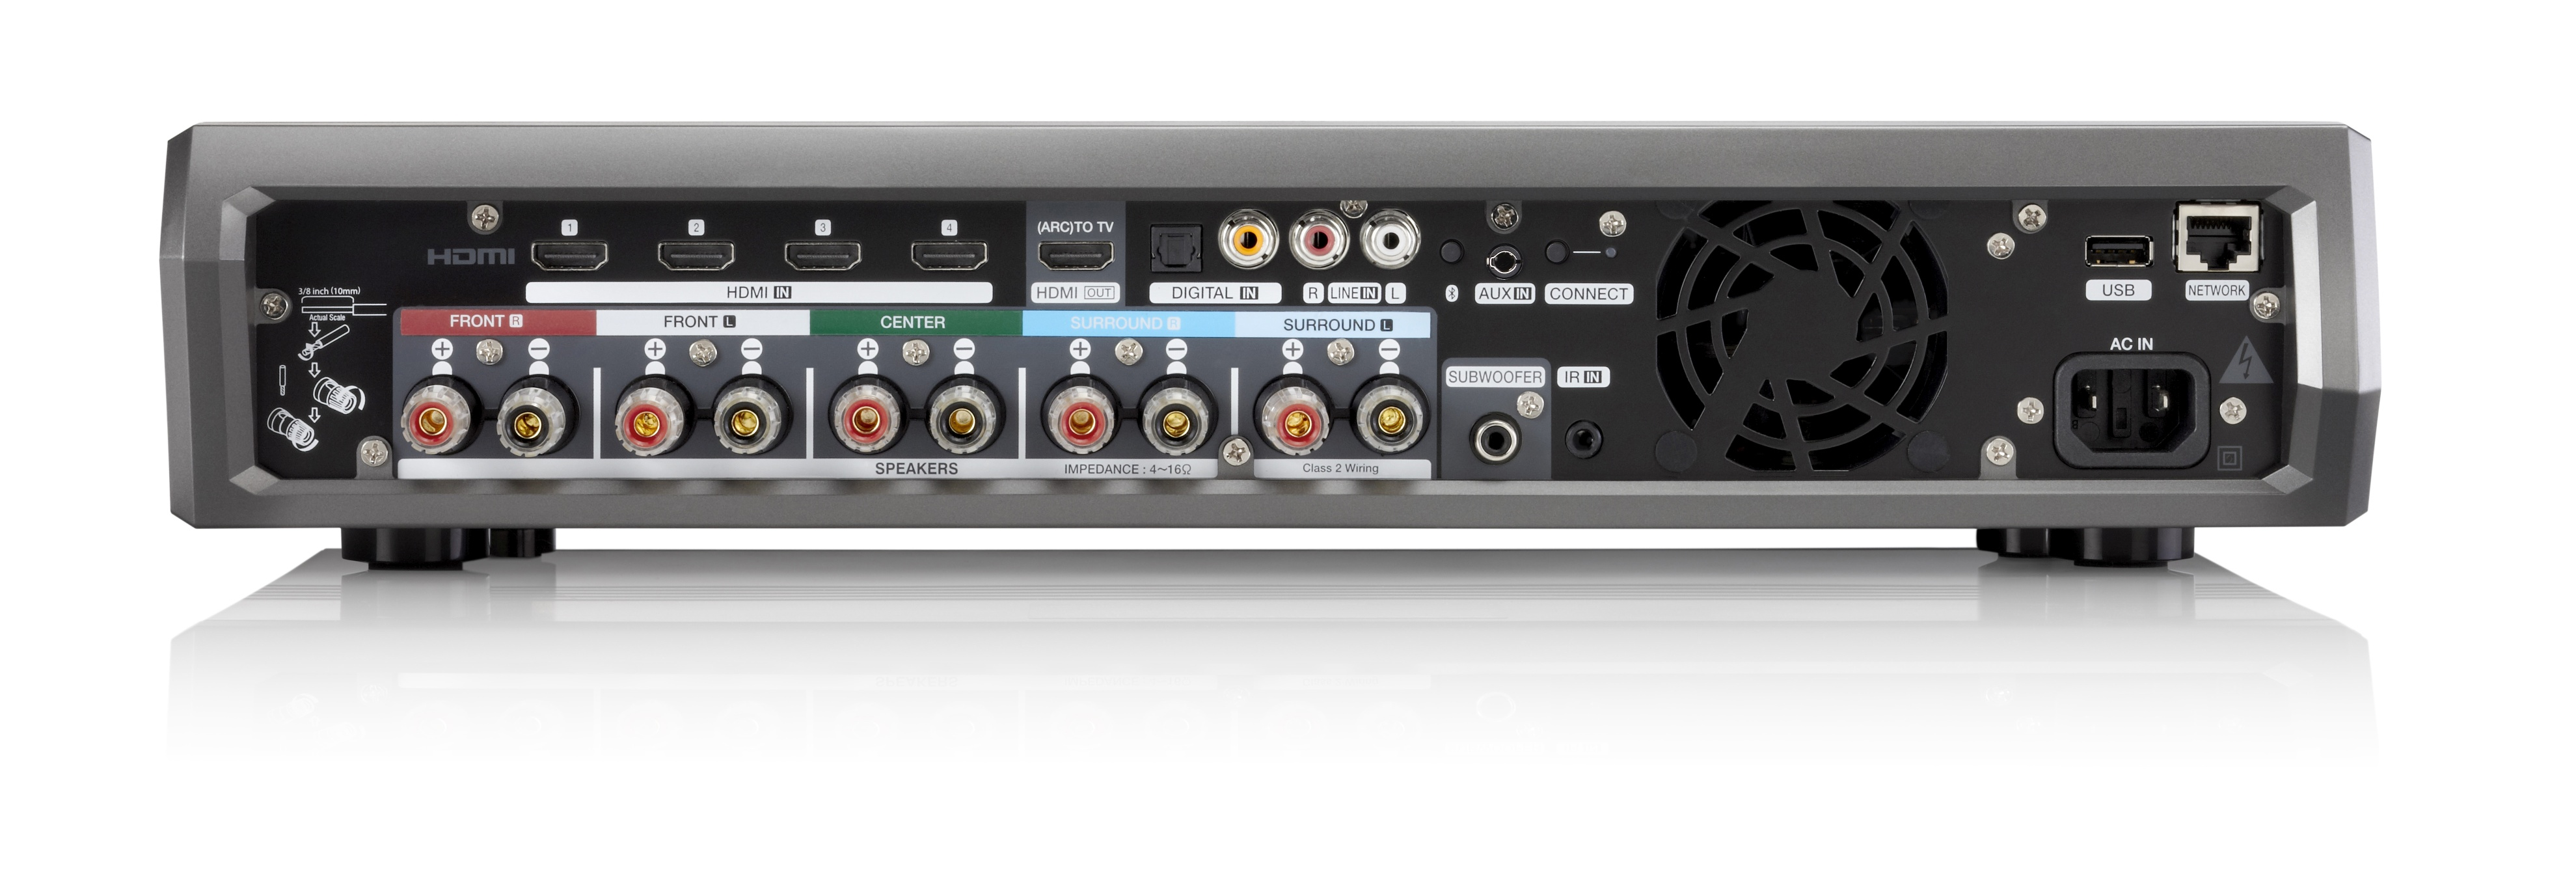 Denon HEOS AVR Product New Denon HEOS Wireless 4K Receiver A Massive Step In New Direction